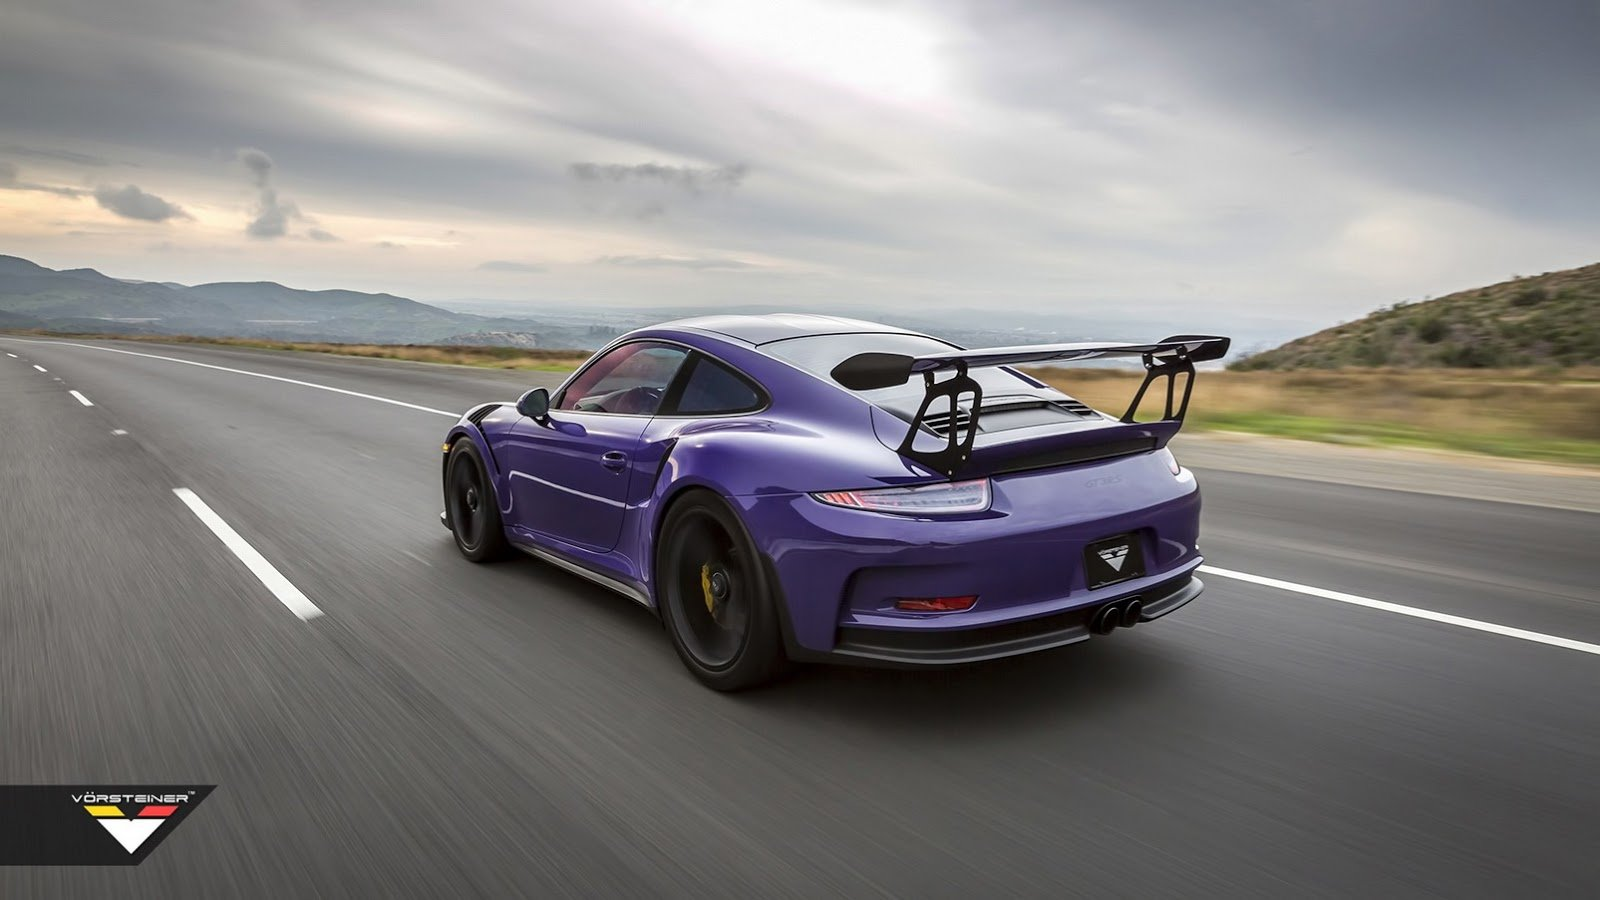 Porsche 911 Gt3 Rs Wallpaper: Purple Vorsteiner Porsche 911 GT3 RS Cars Modified